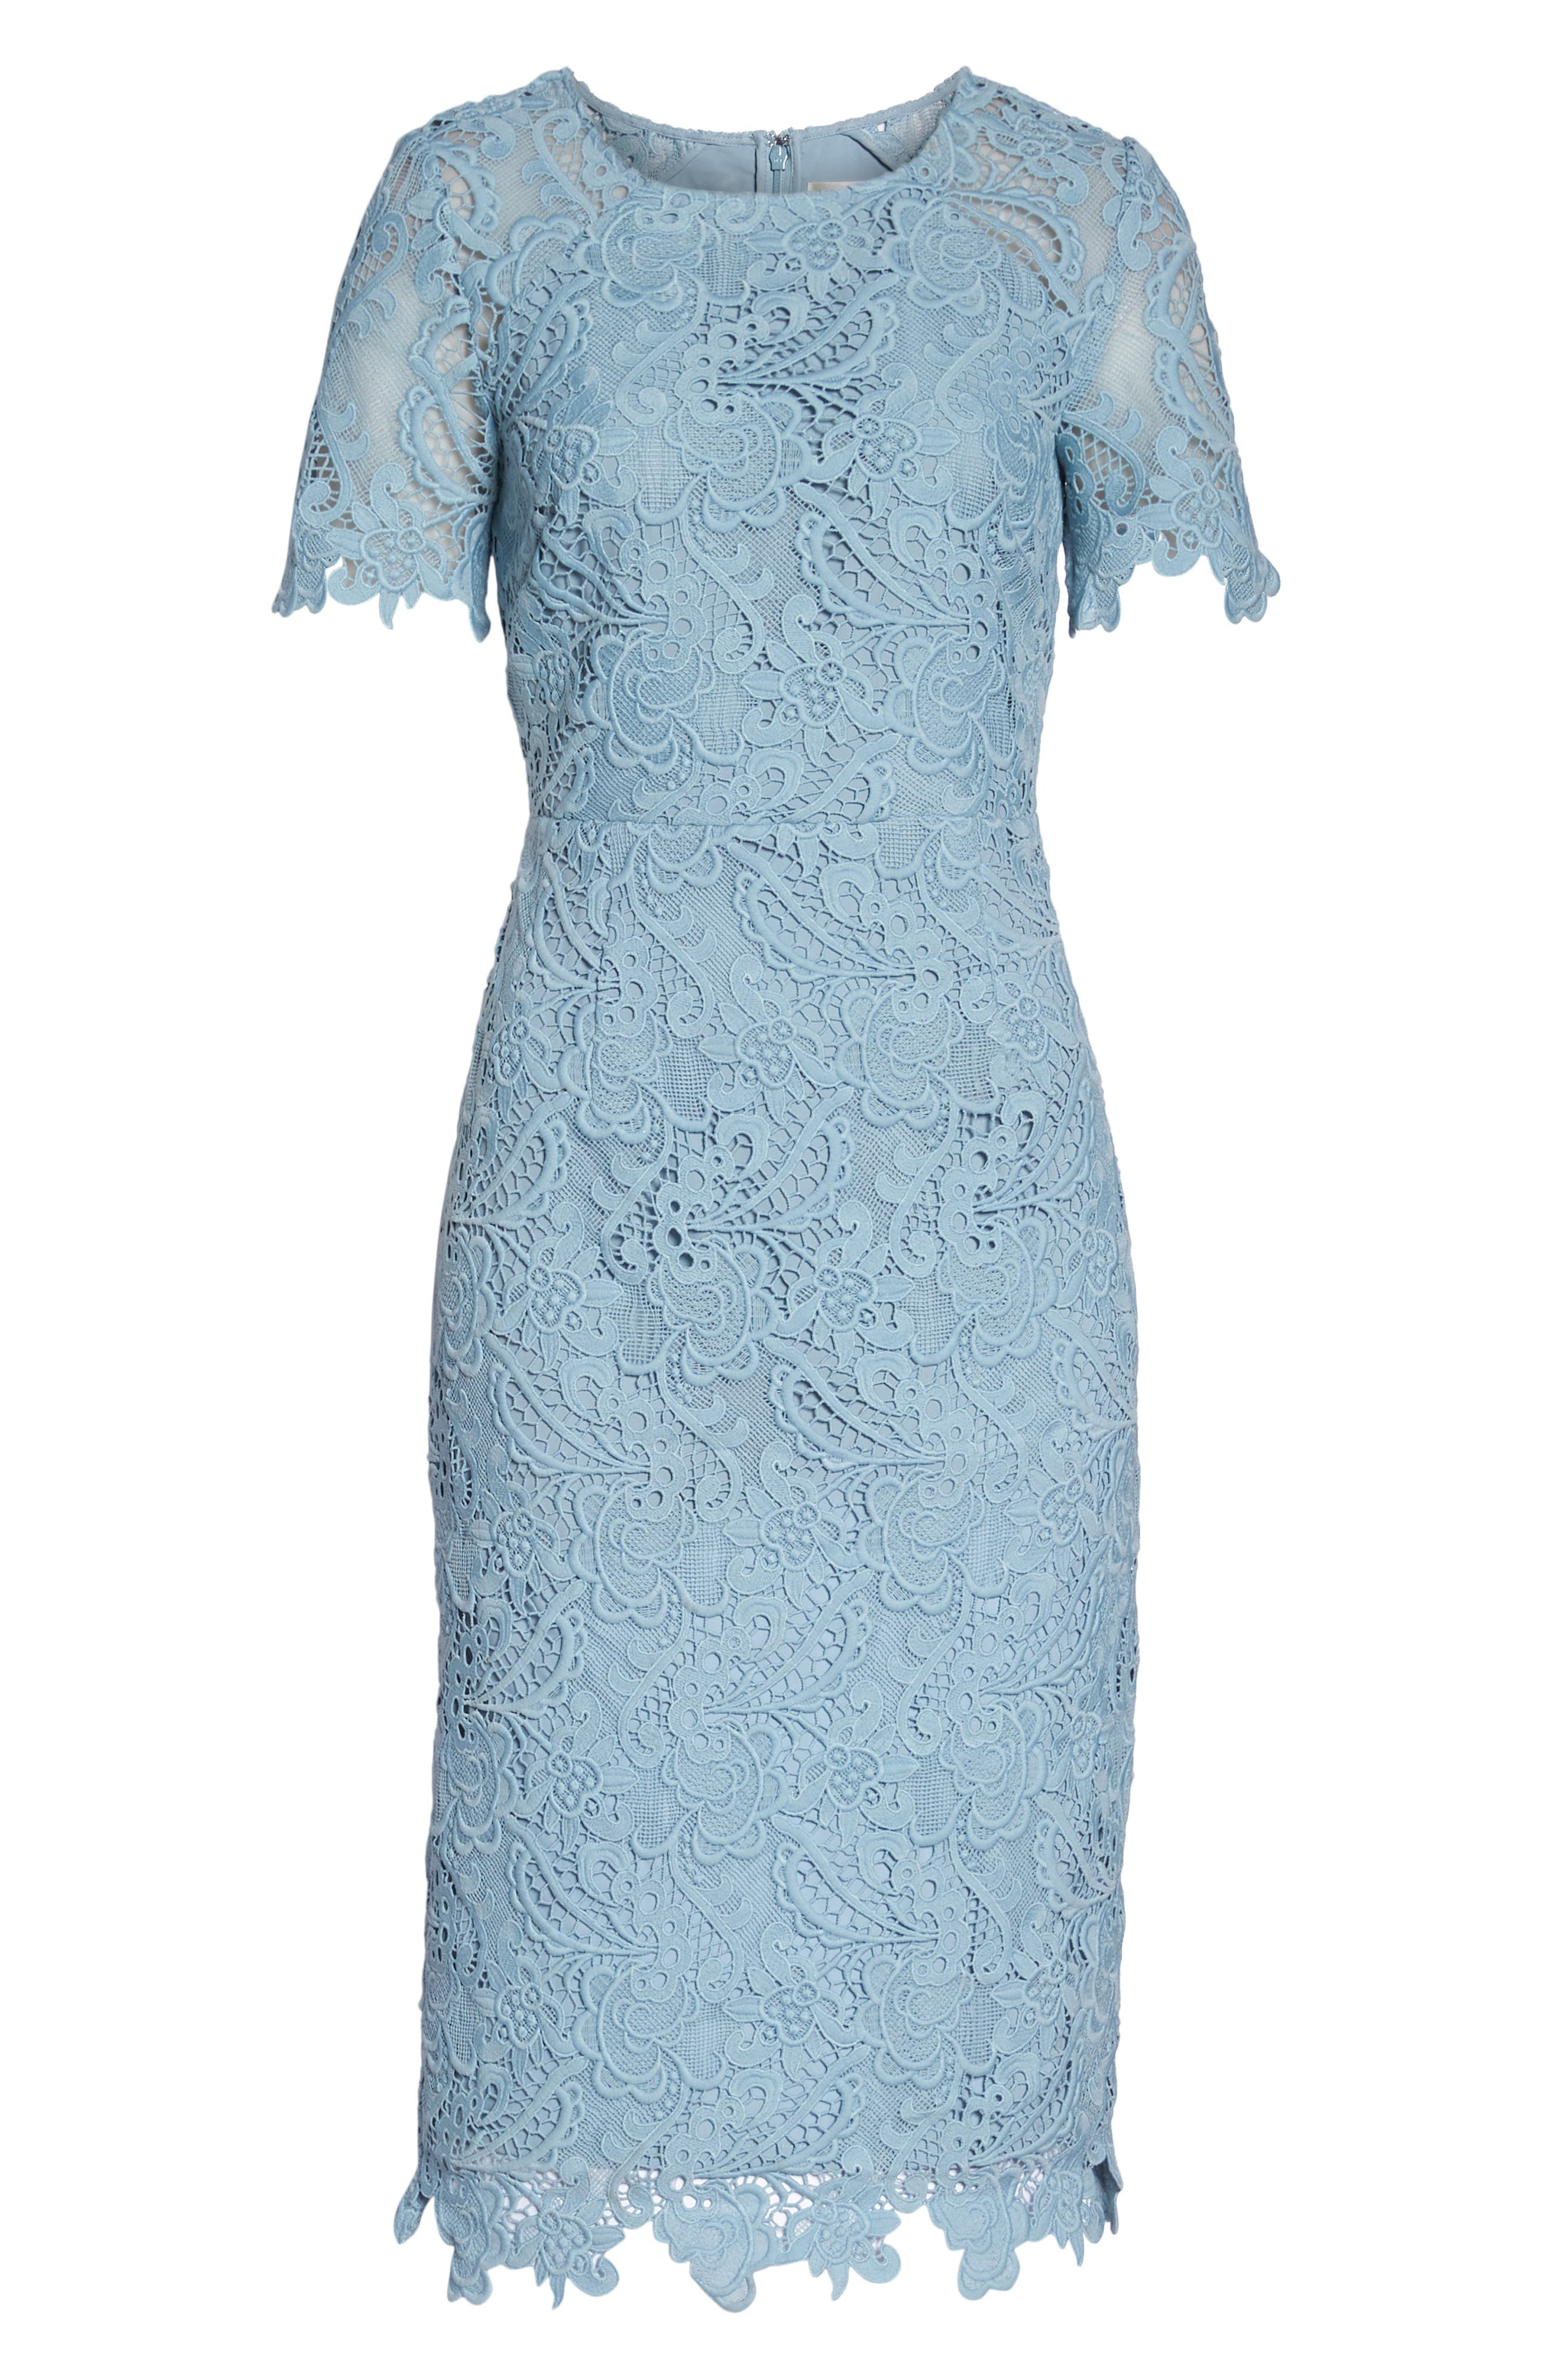 Lace Sheath Dress,                             Alternate thumbnail 7, color,                             BLUE